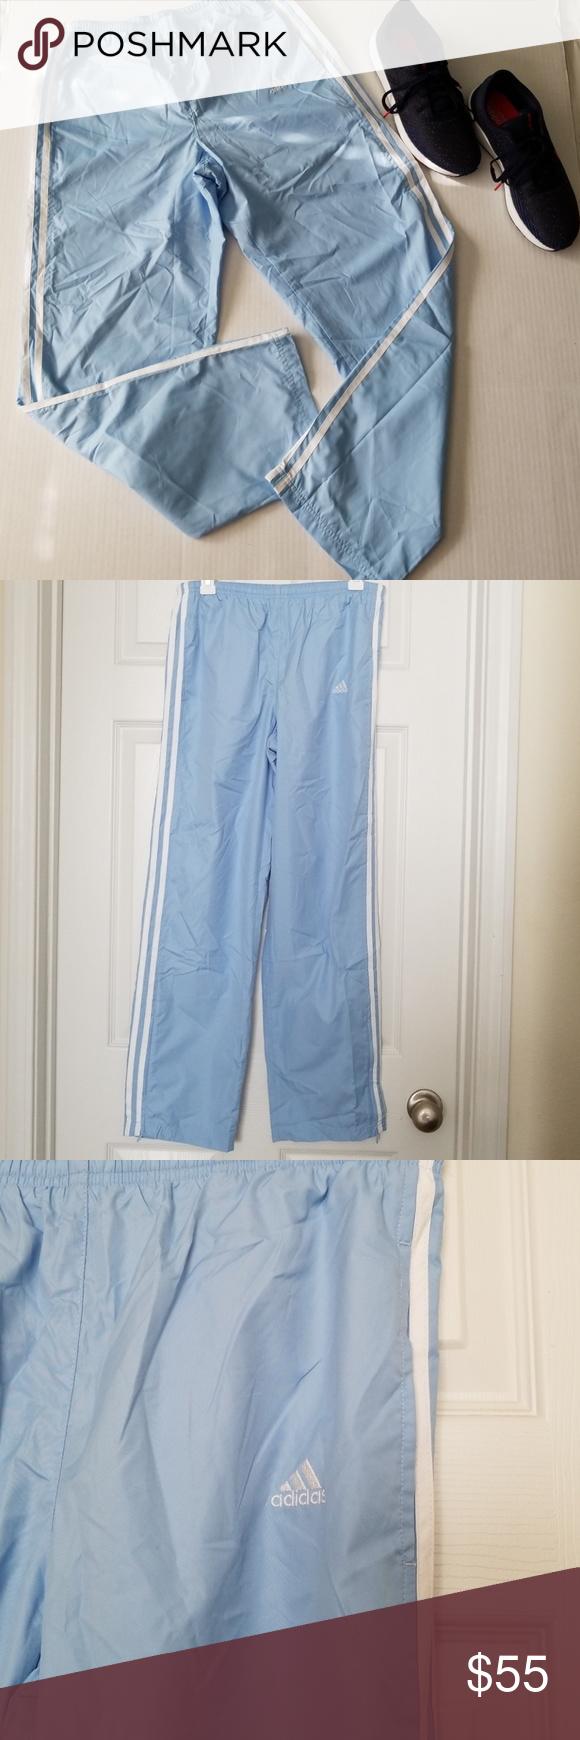 adidas pants light blue